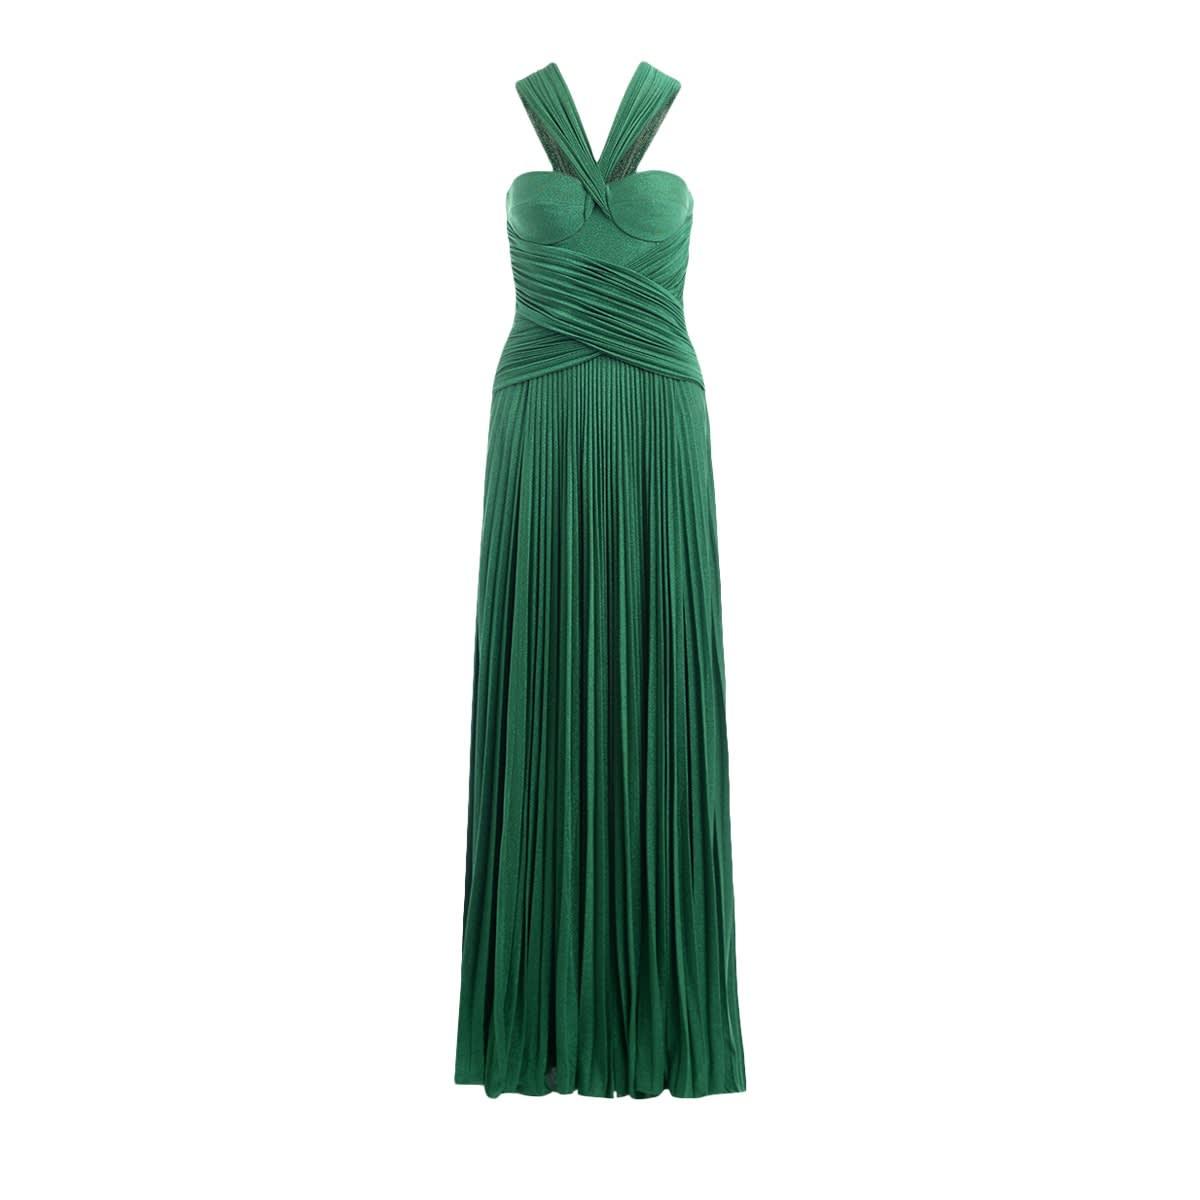 Buy Maxi Dress Elisabetta Franchi Emerald Green With Plissé online, shop Elisabetta Franchi Celyn B. with free shipping